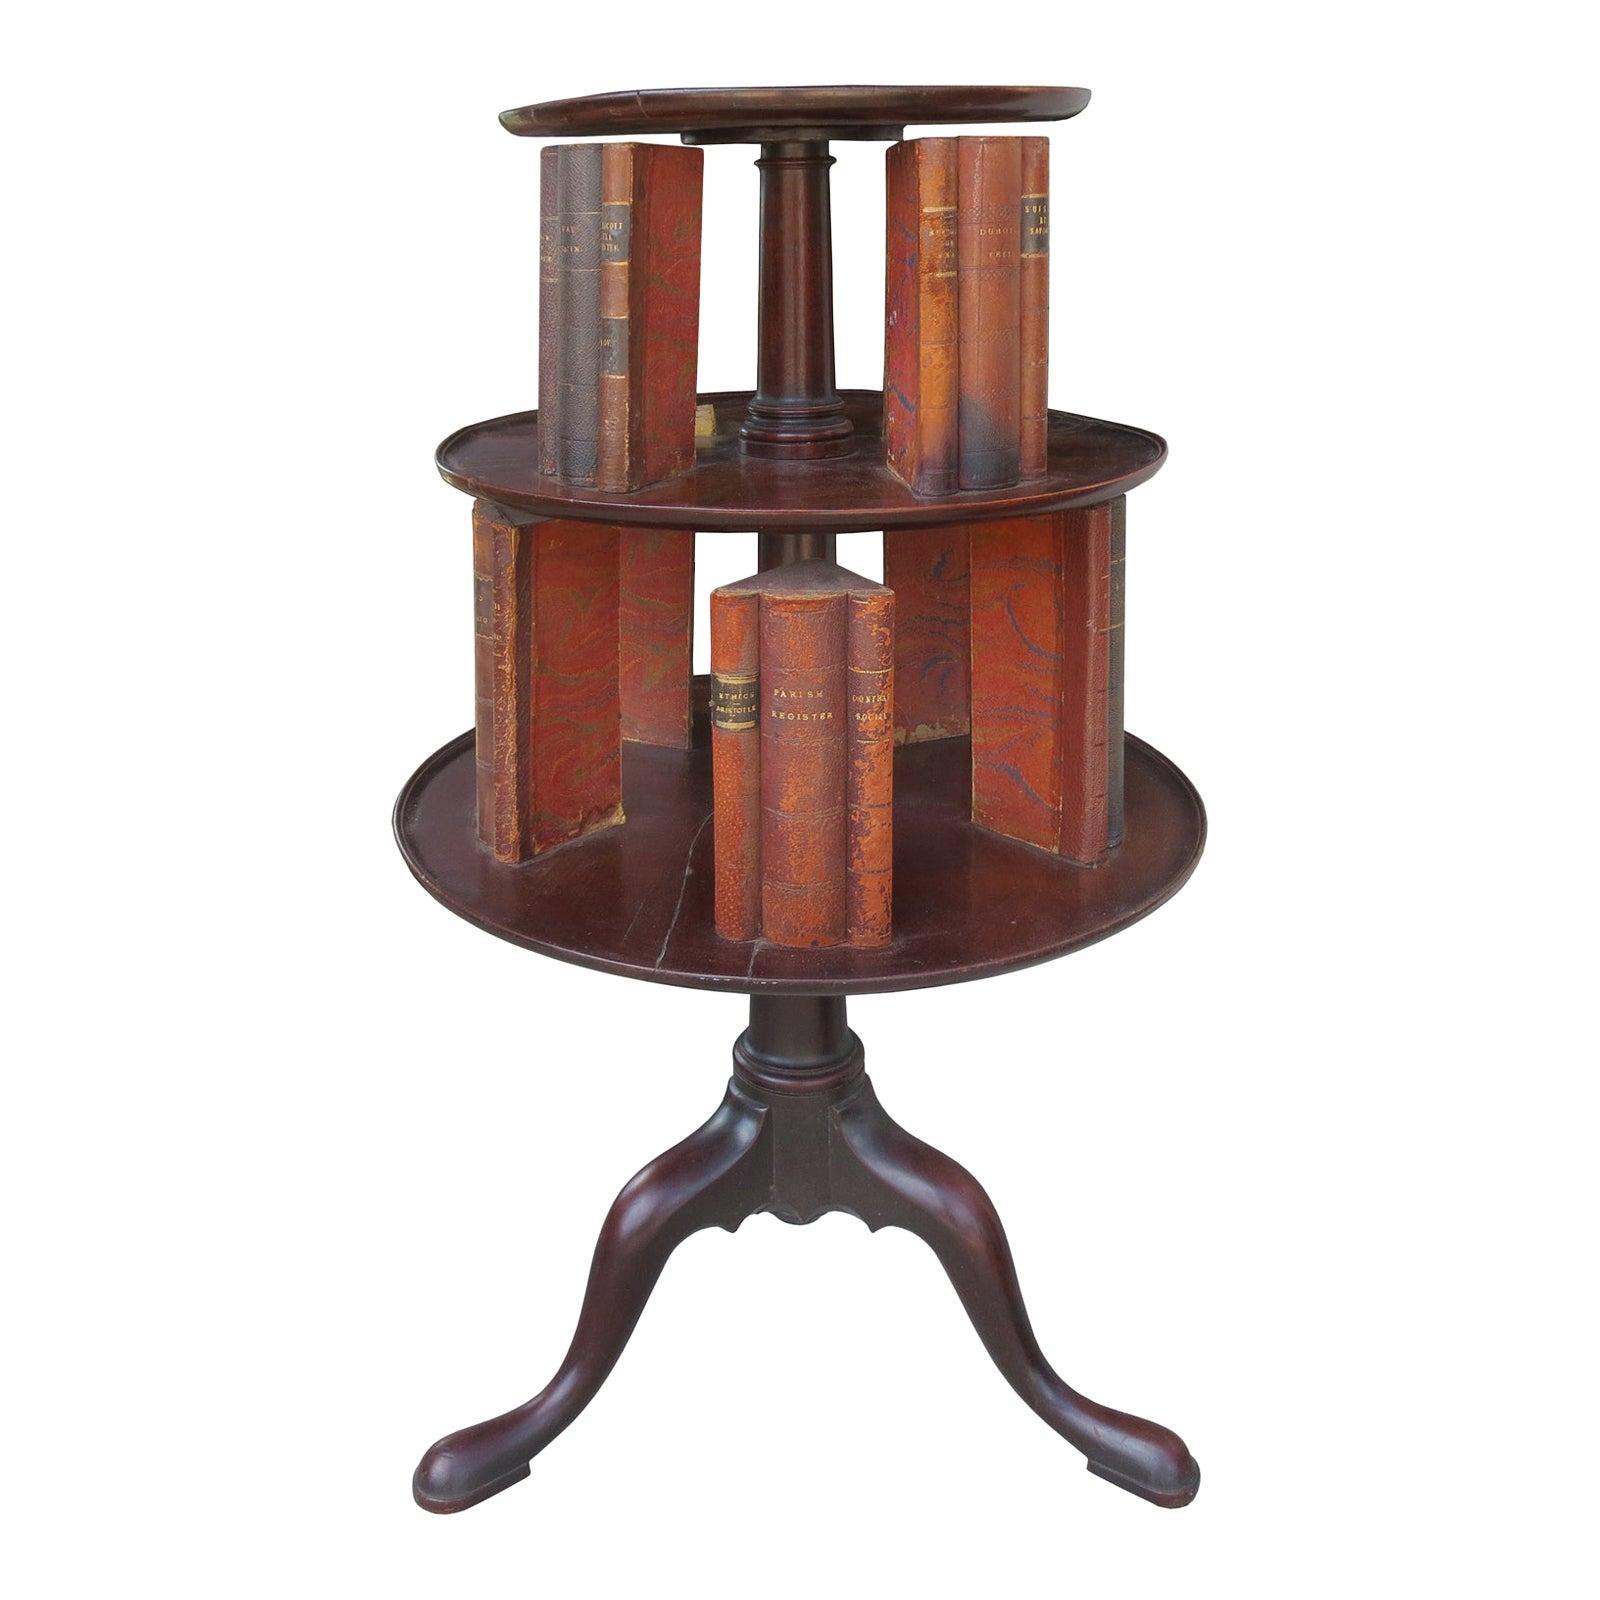 19th Century English Classic Revolving Book Stand, Mahogany